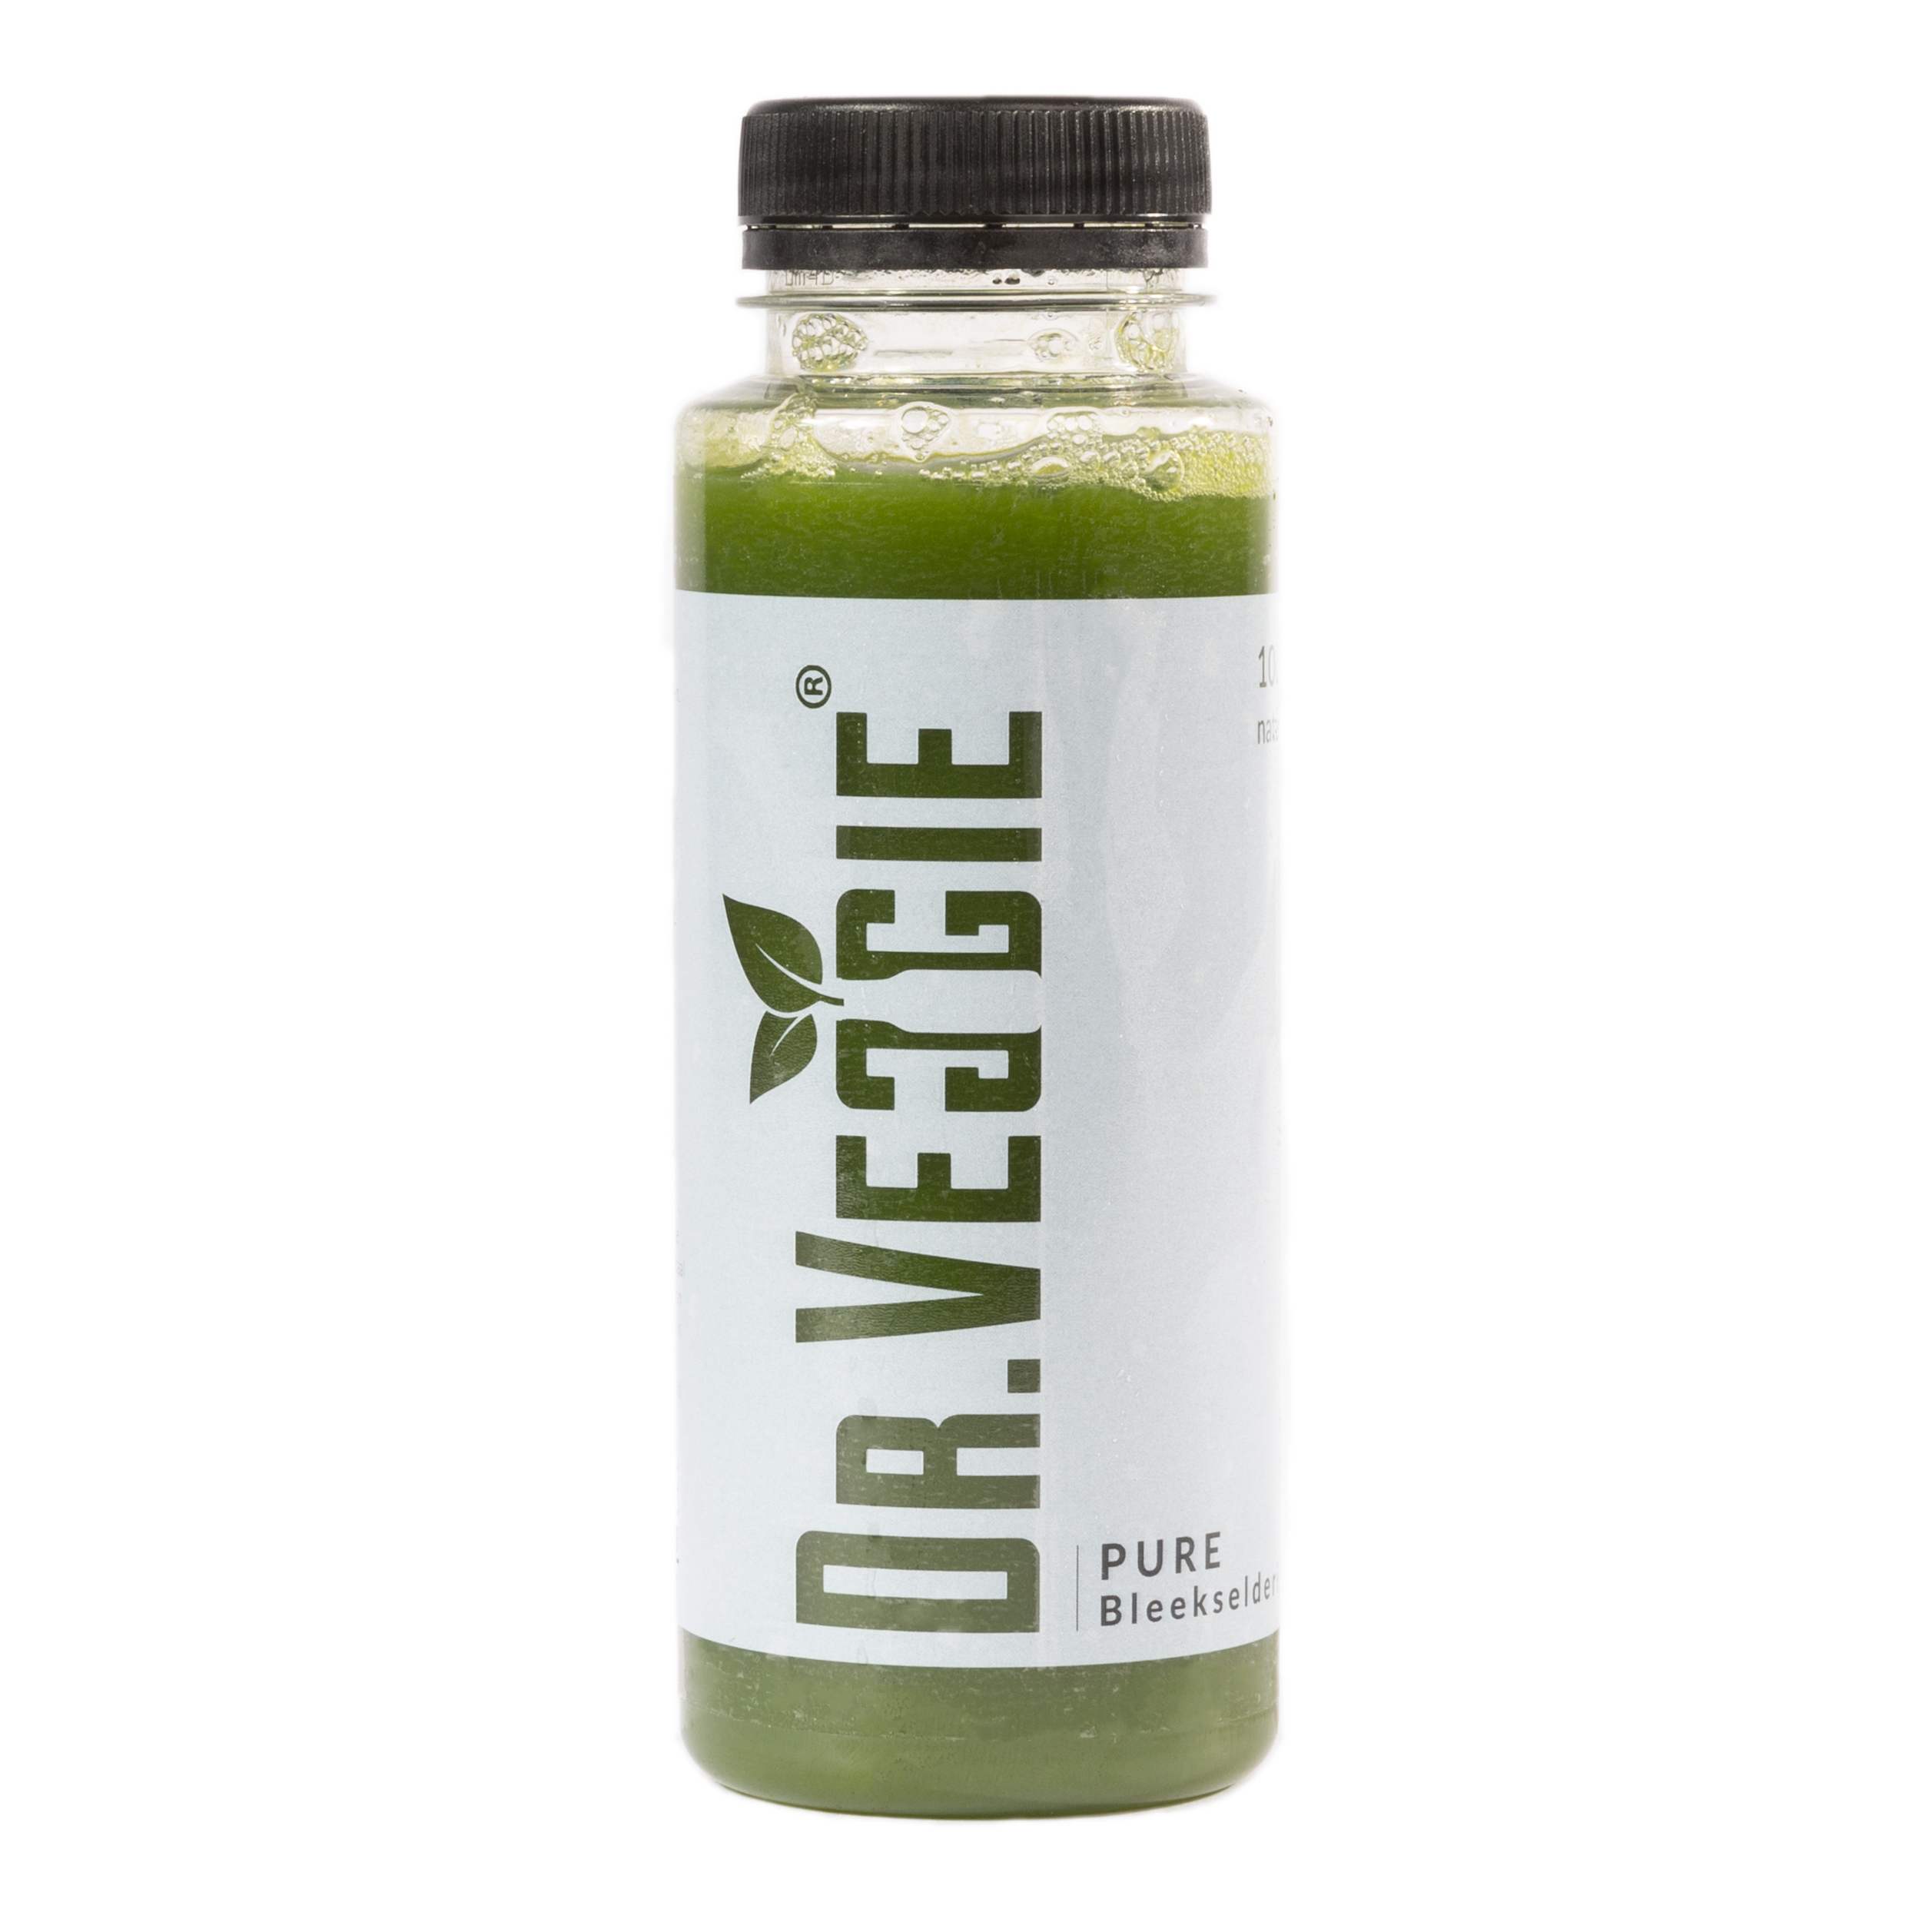 Dr Veggie groentesap bleekselderij